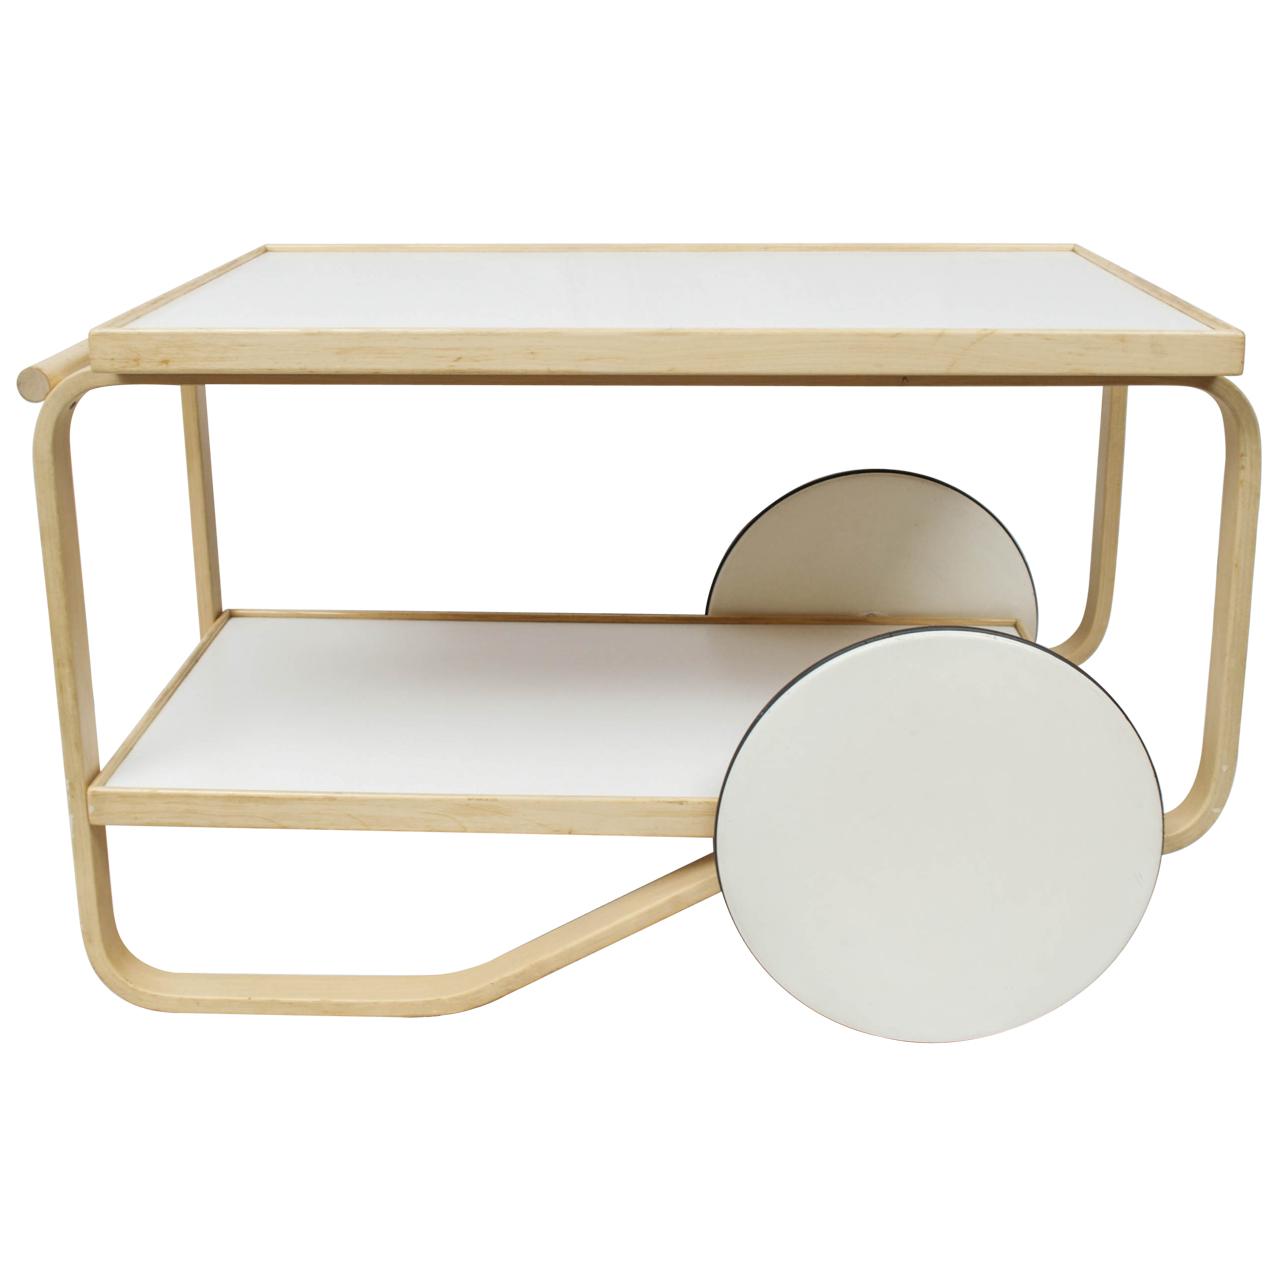 Penccil alvar aalto furniture - Alvar aalto muebles ...